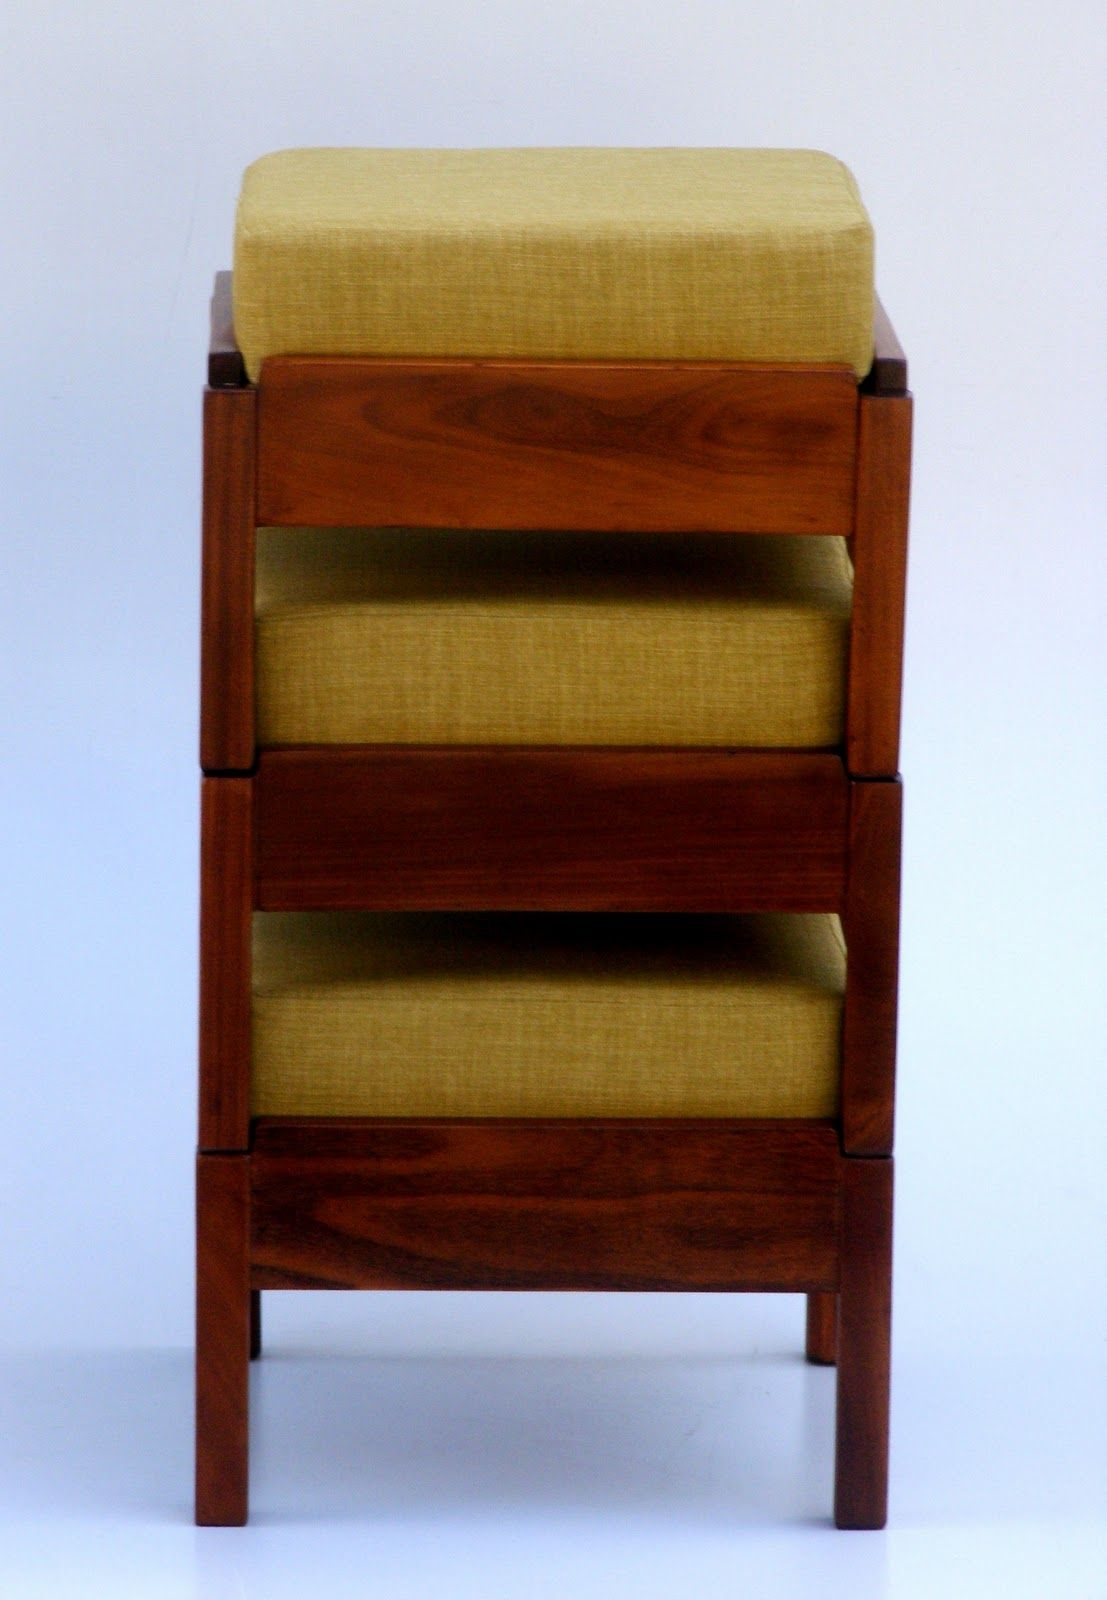 Vintage Modern Stacking Ottomans Furniture Funky